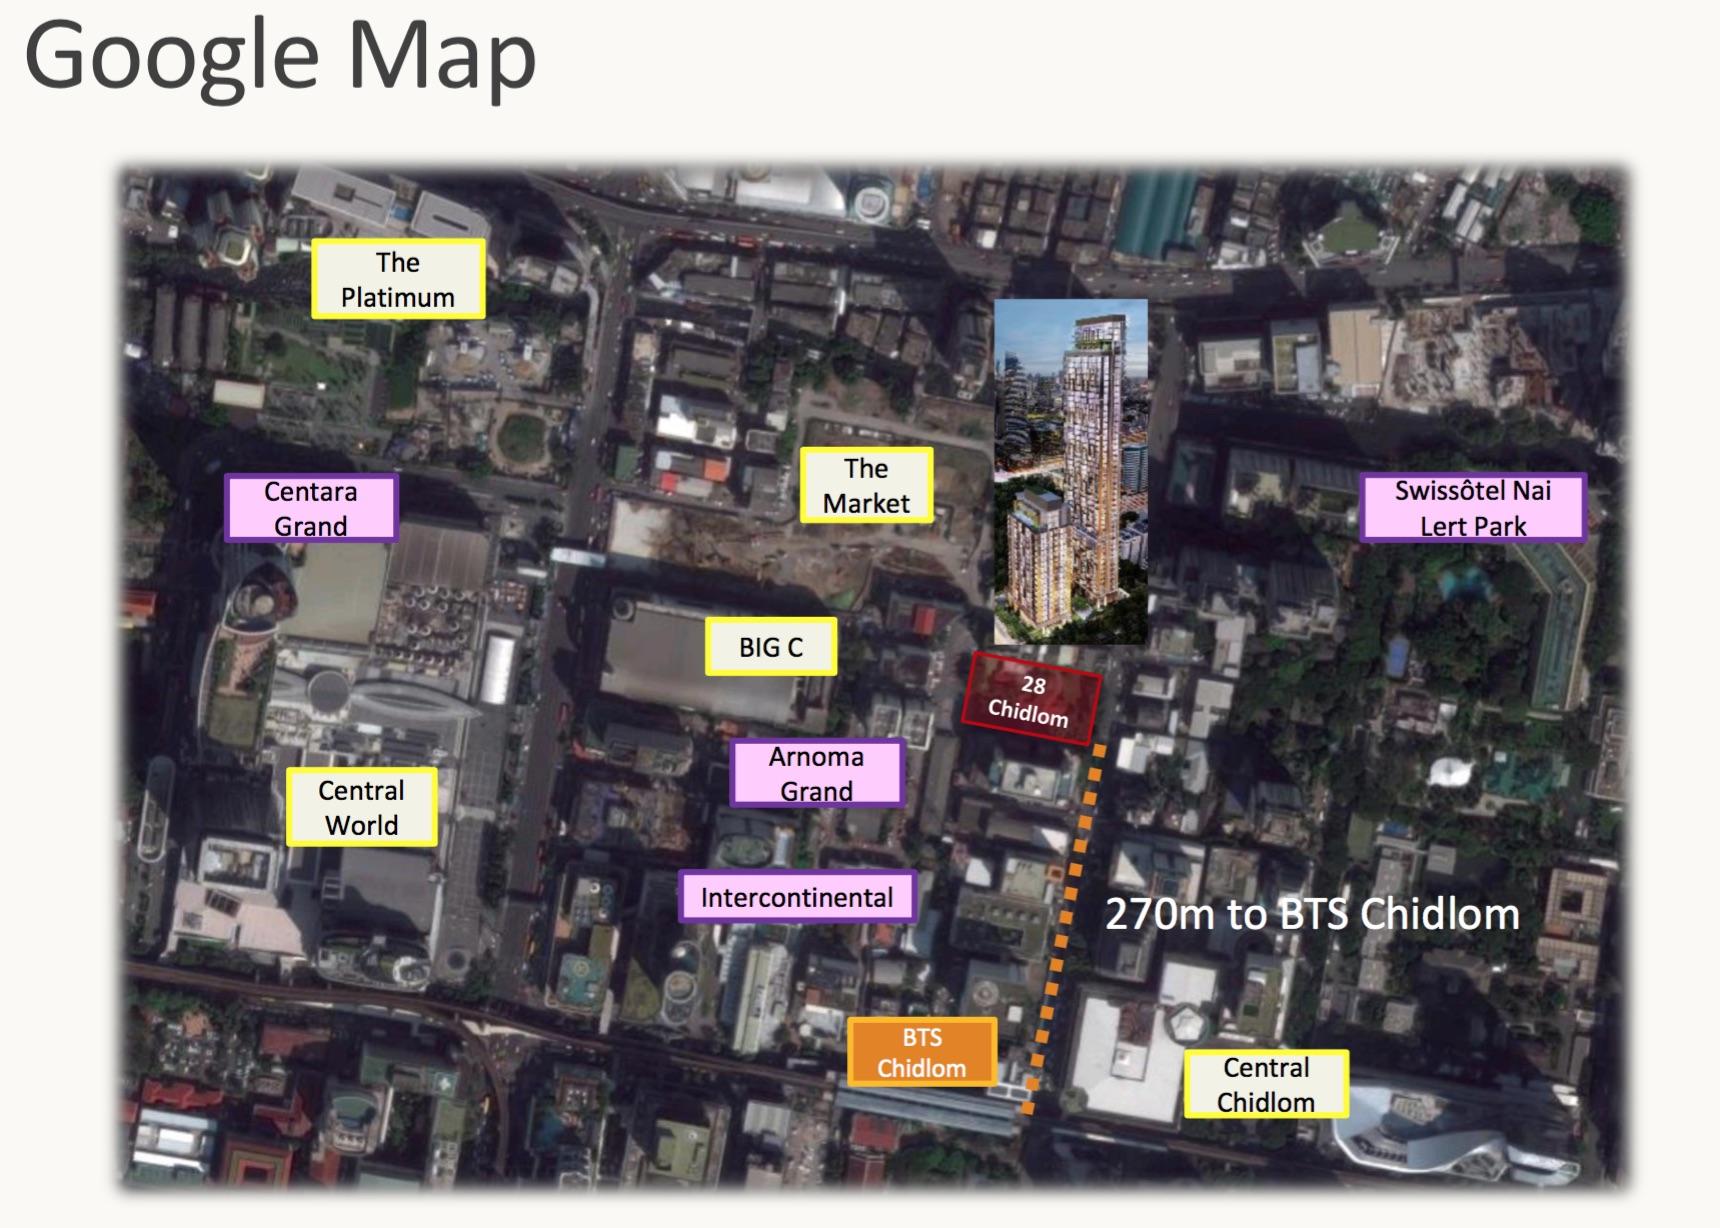 28 chidlom residences bangkok condo condo launch sg 28 chidlom google map gumiabroncs Images